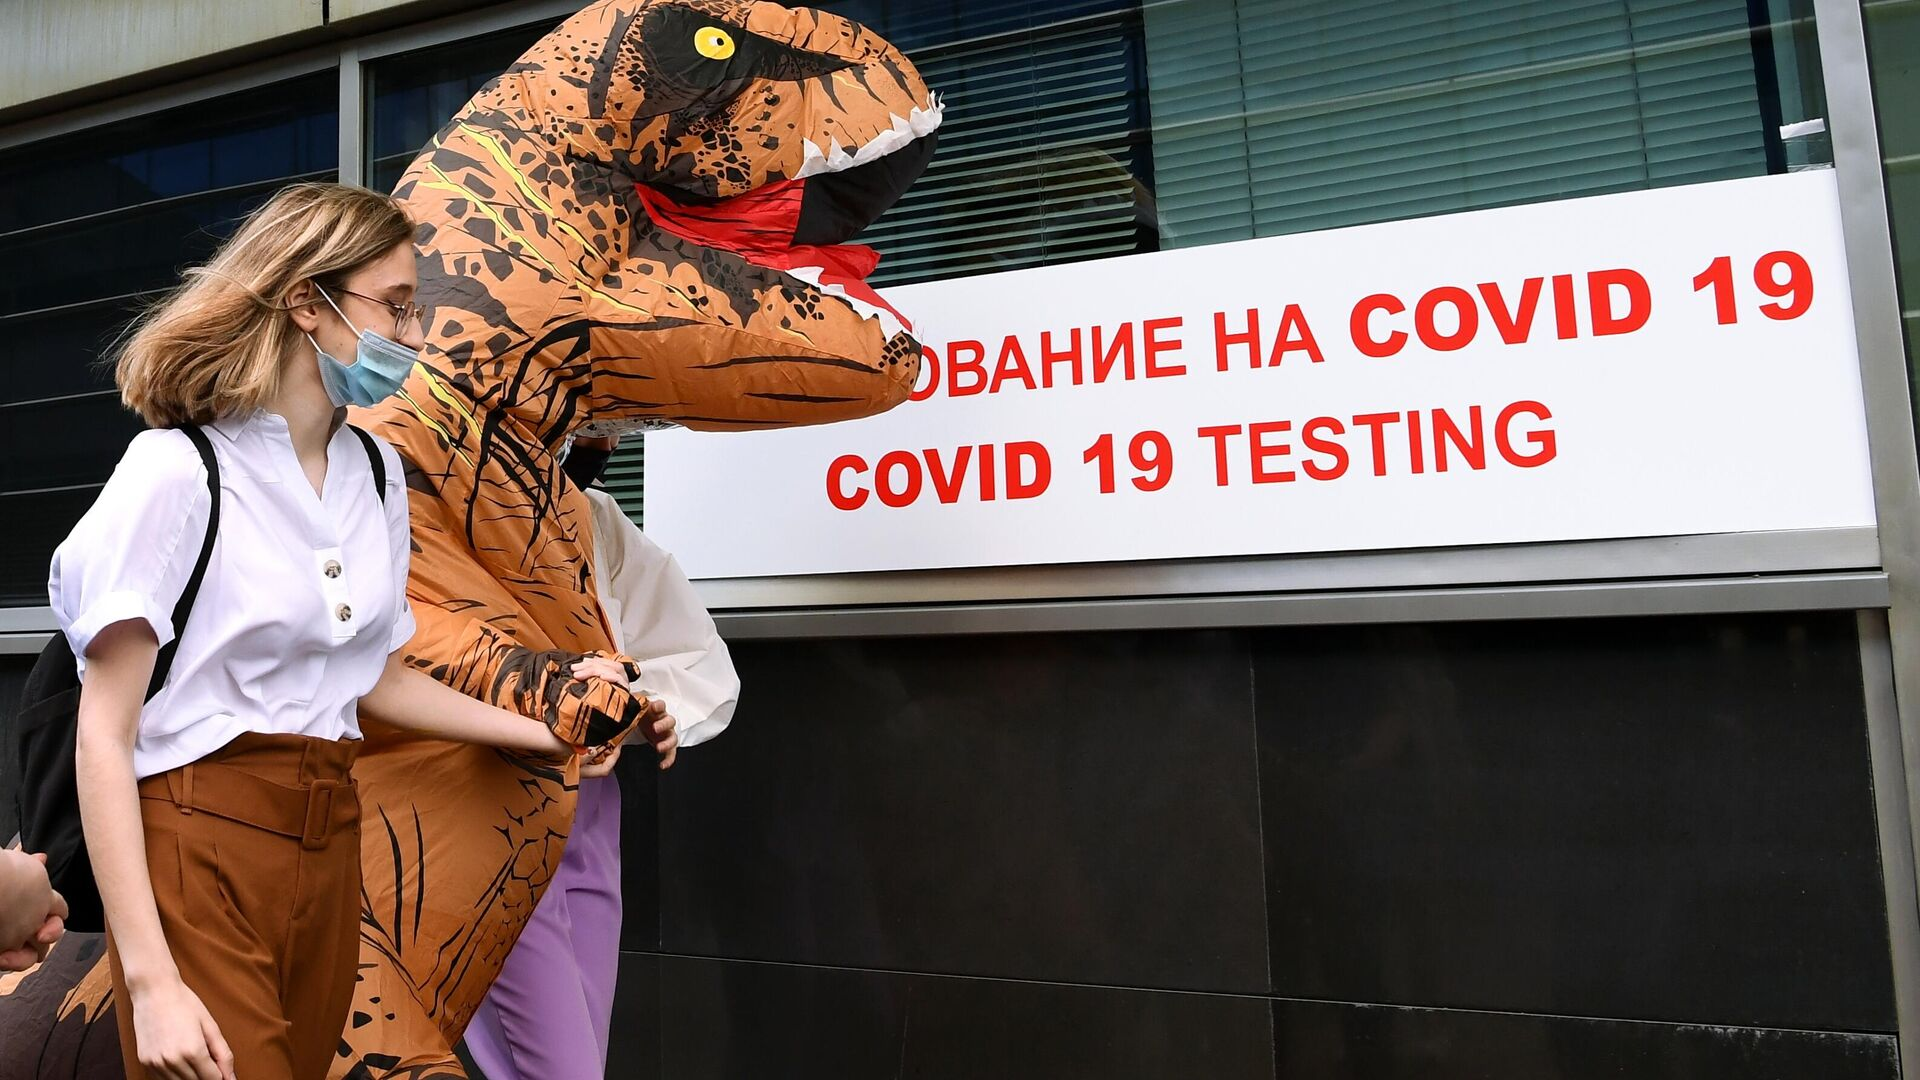 Пассажирка перед экспресс-тестированием на COVID-19 в международном аэропорту Внуково  - РИА Новости, 1920, 11.09.2020